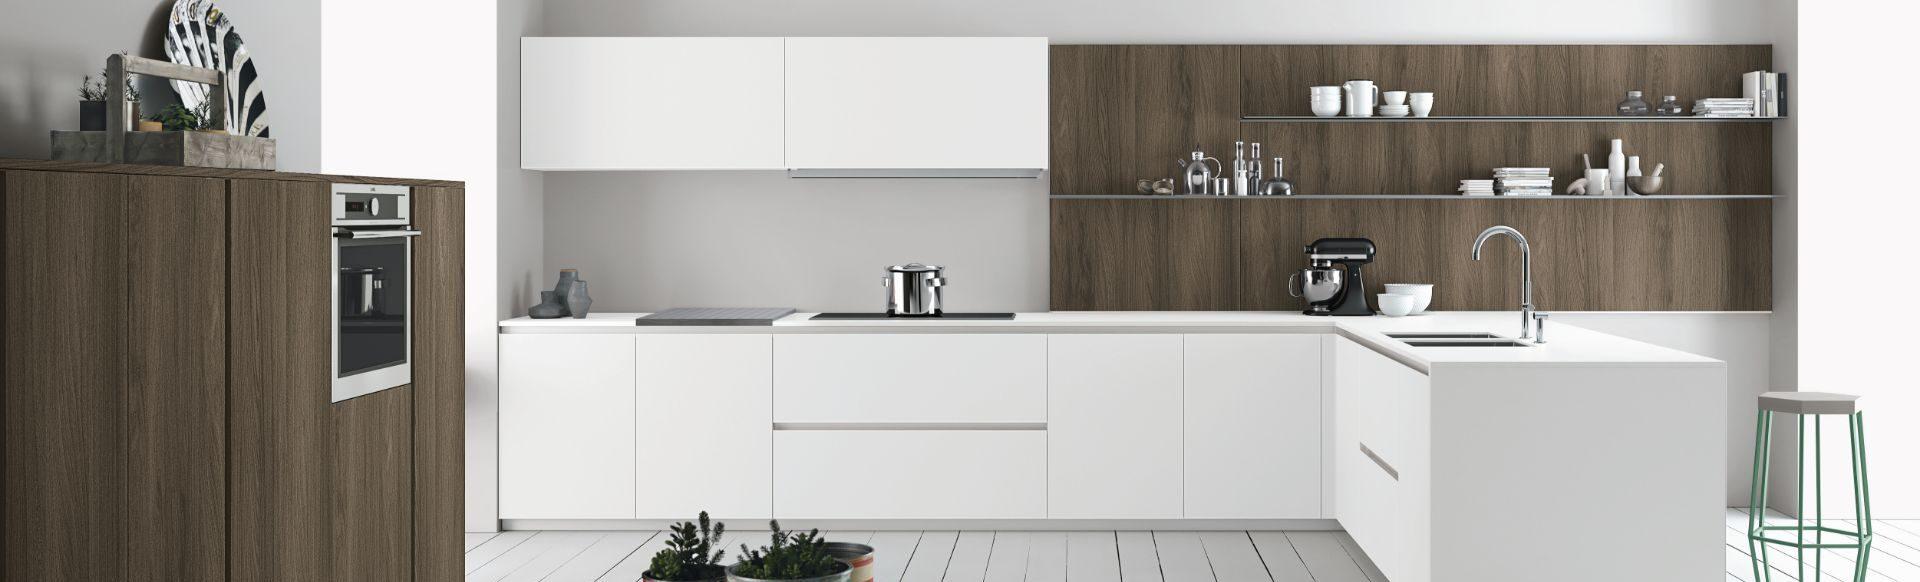 slider-cocina-aspen-3